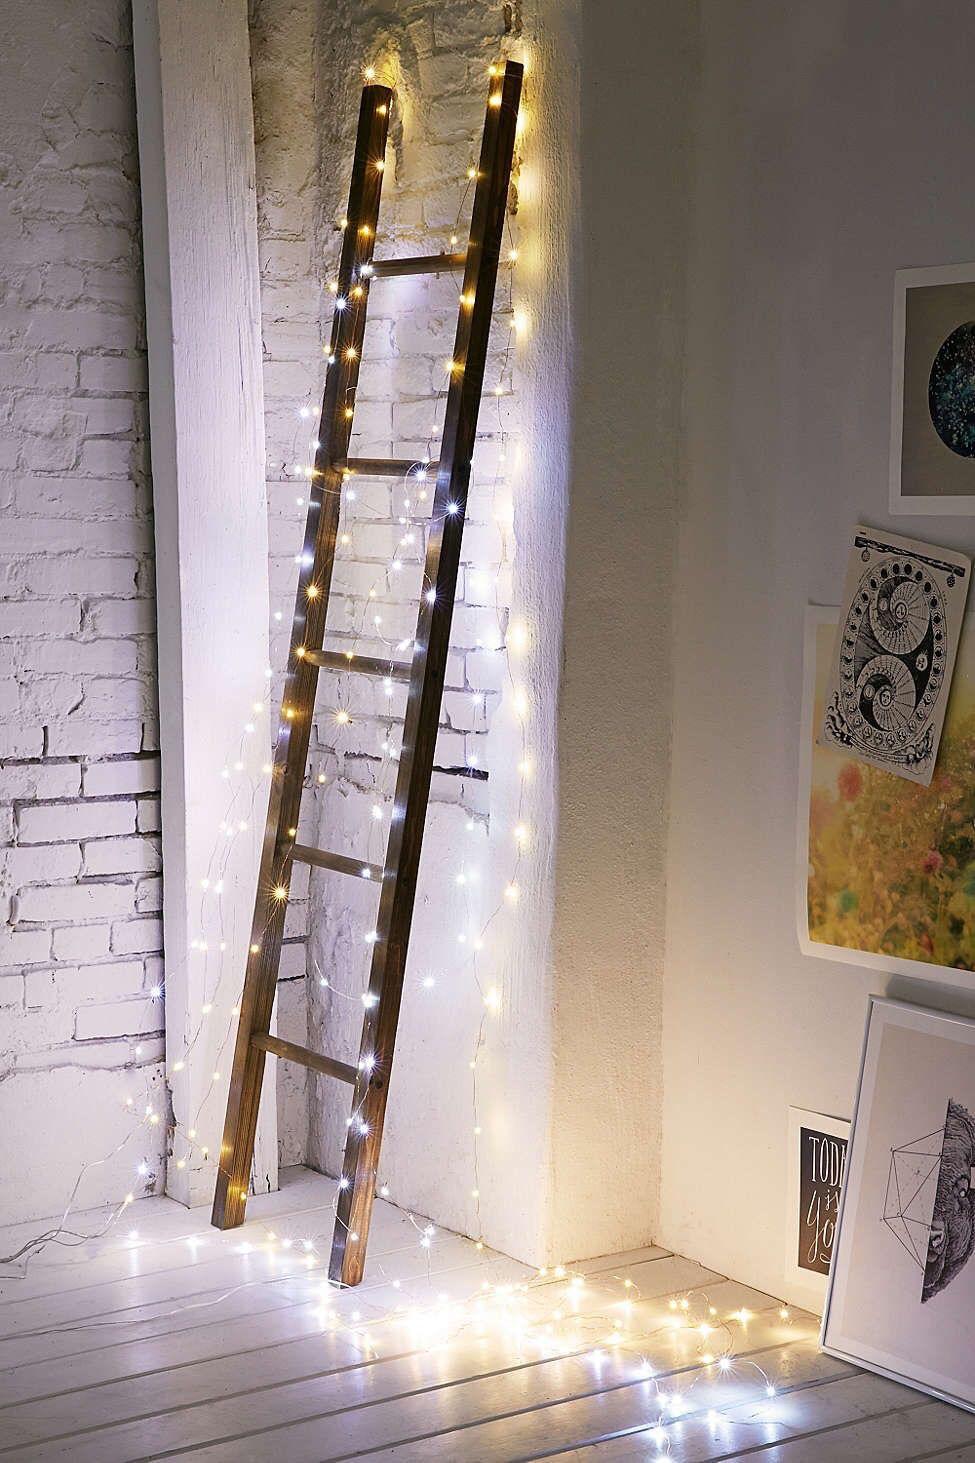 Decorative ladder tangled in string lights